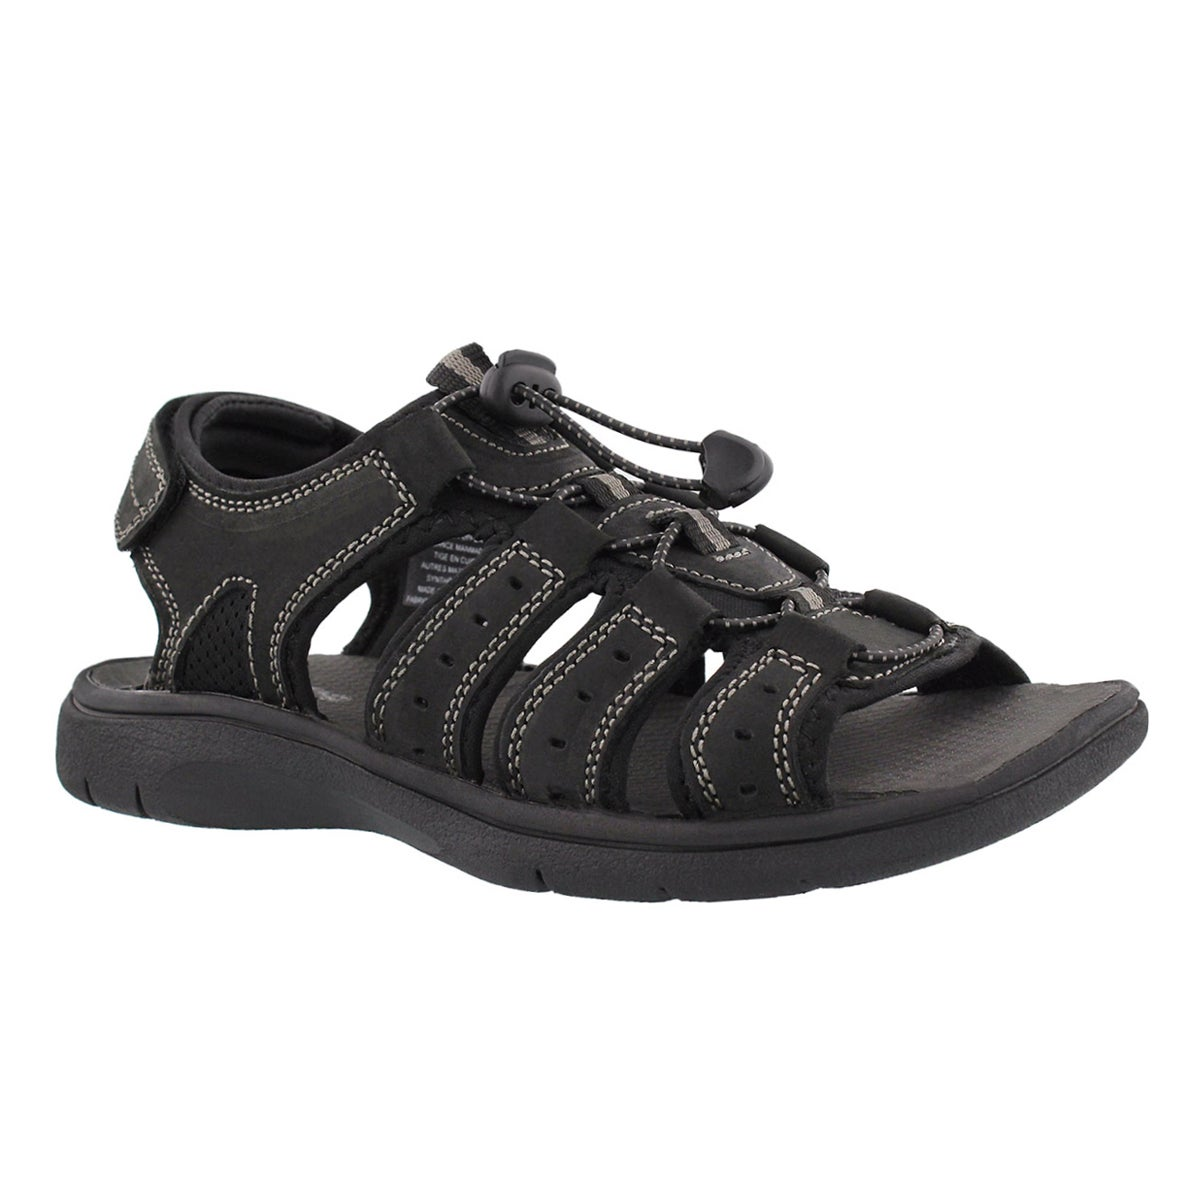 Men's LAZAR black sport sandals